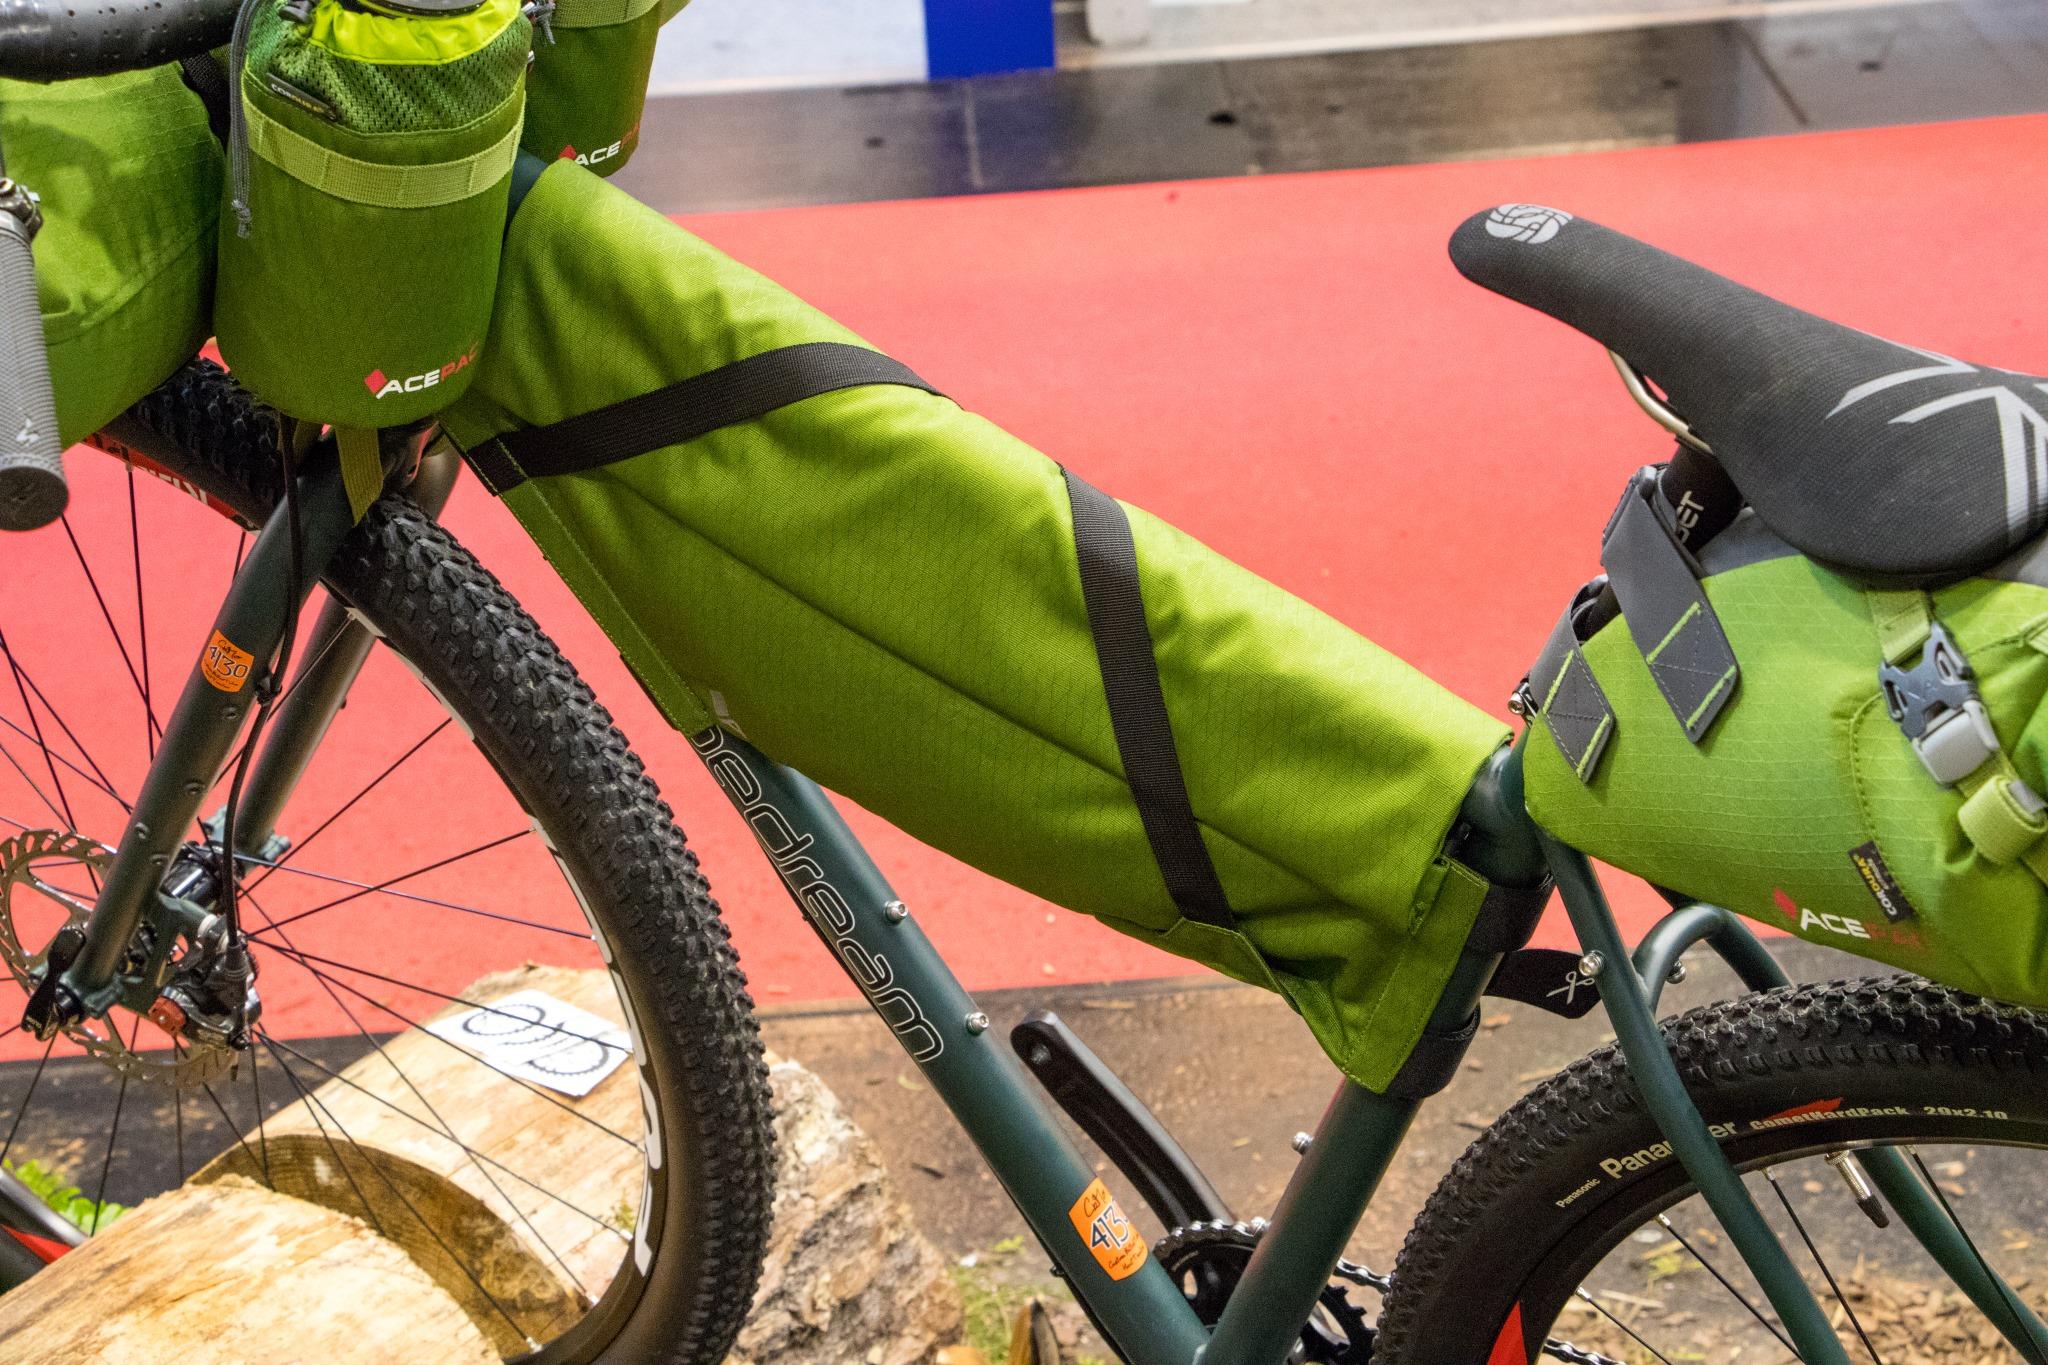 acepack_bikepacking007